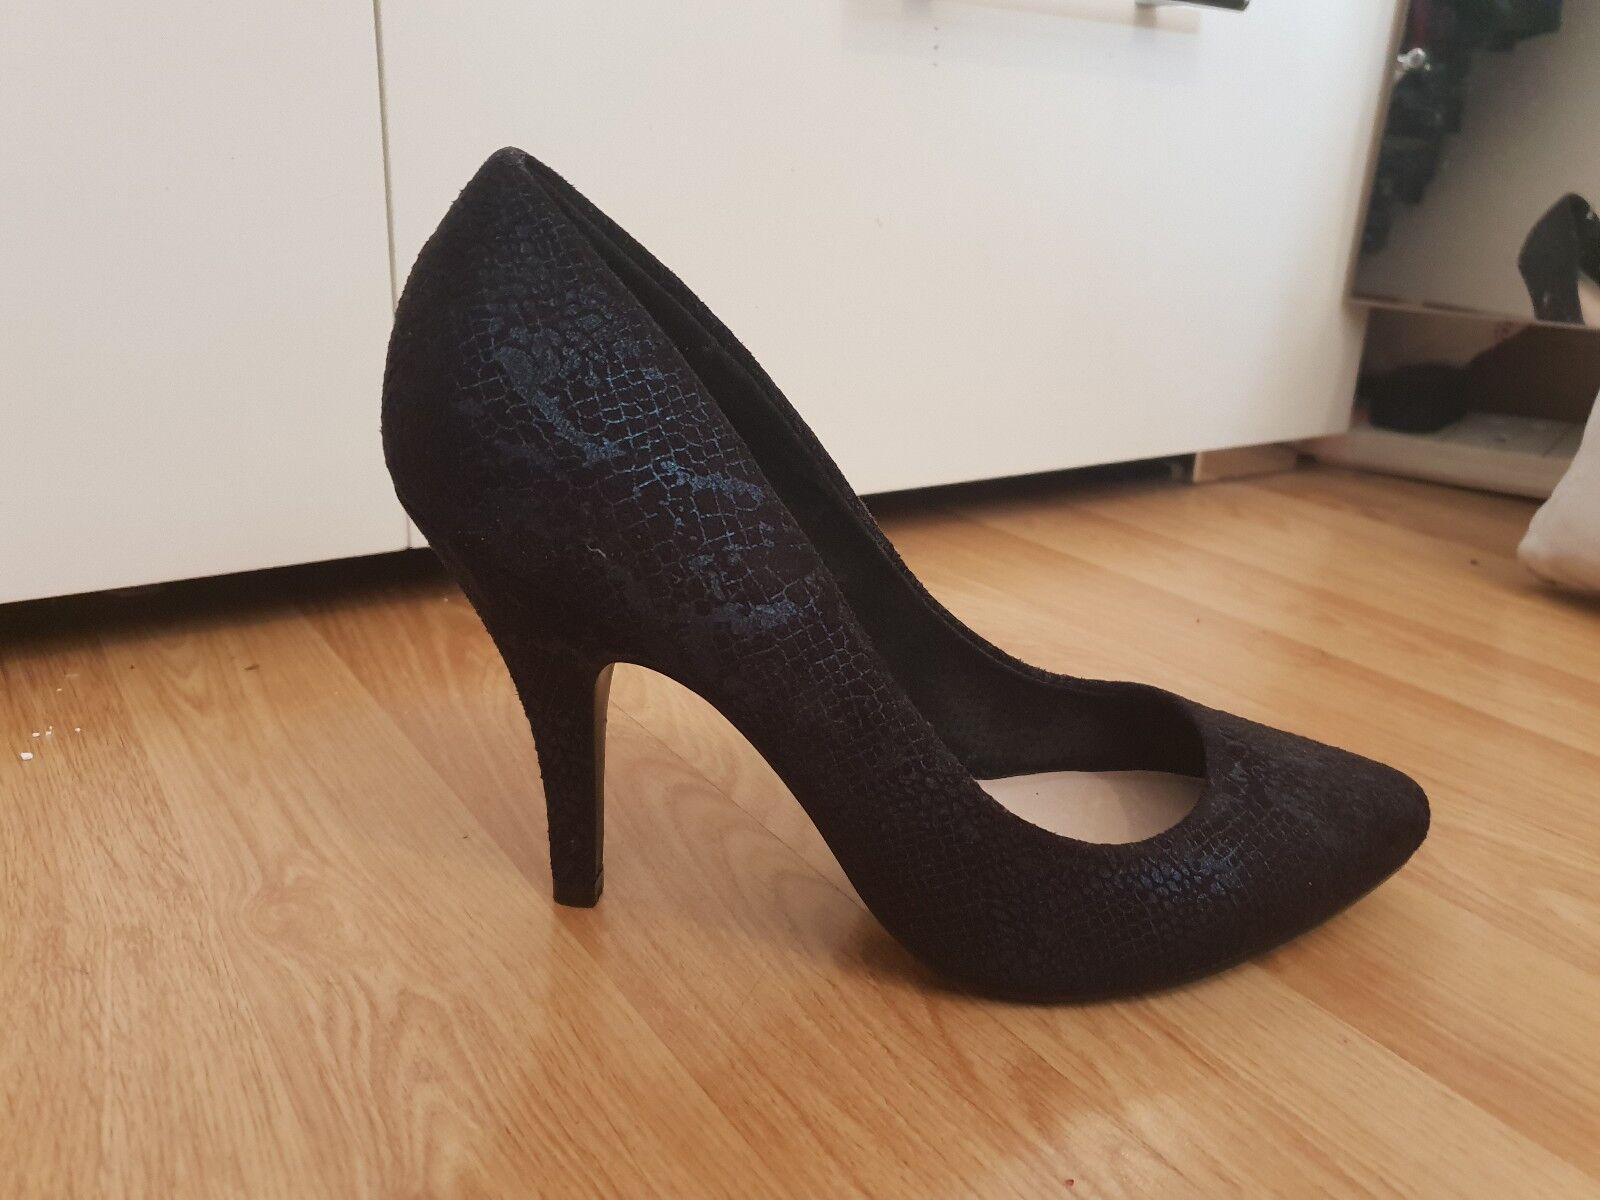 Navy bluee croc print shoes, size 7